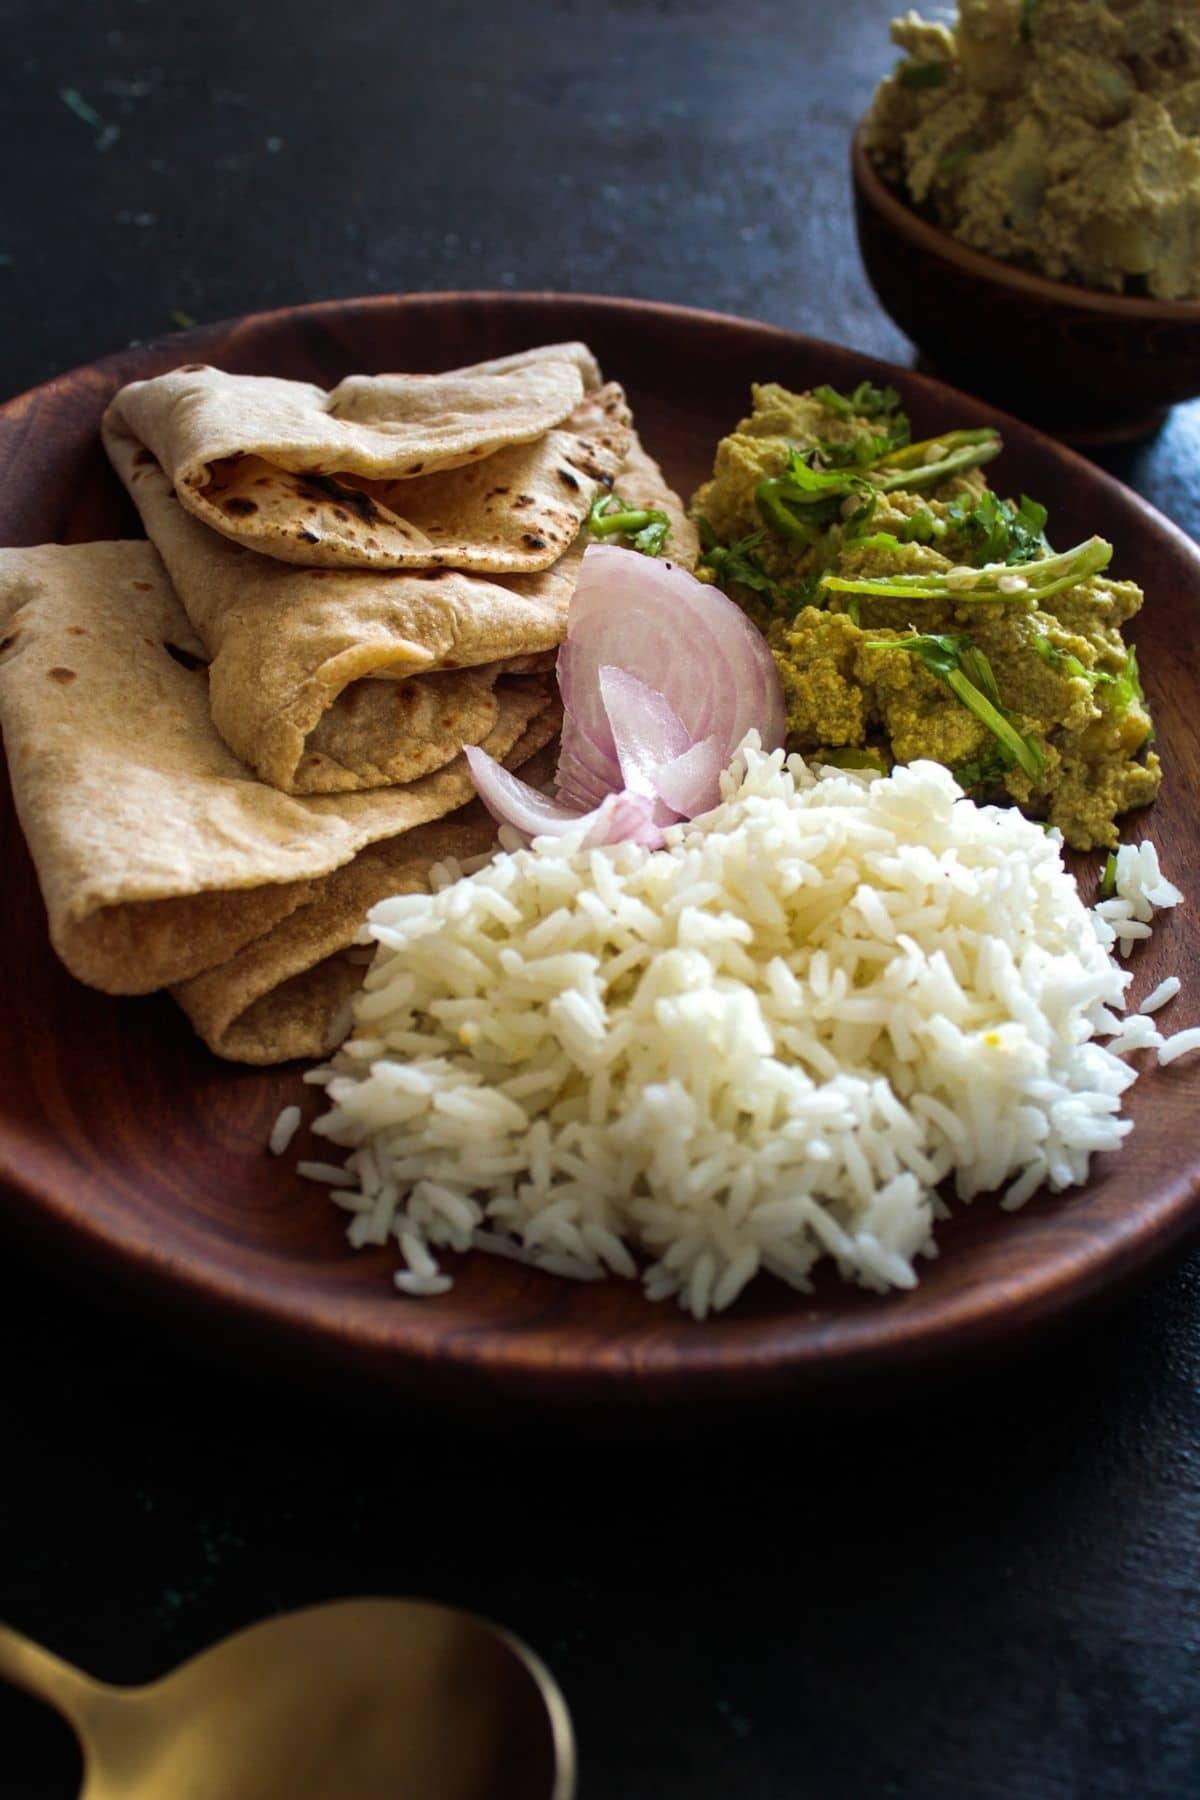 Roti rice and aloo posto on large brown plate on black table